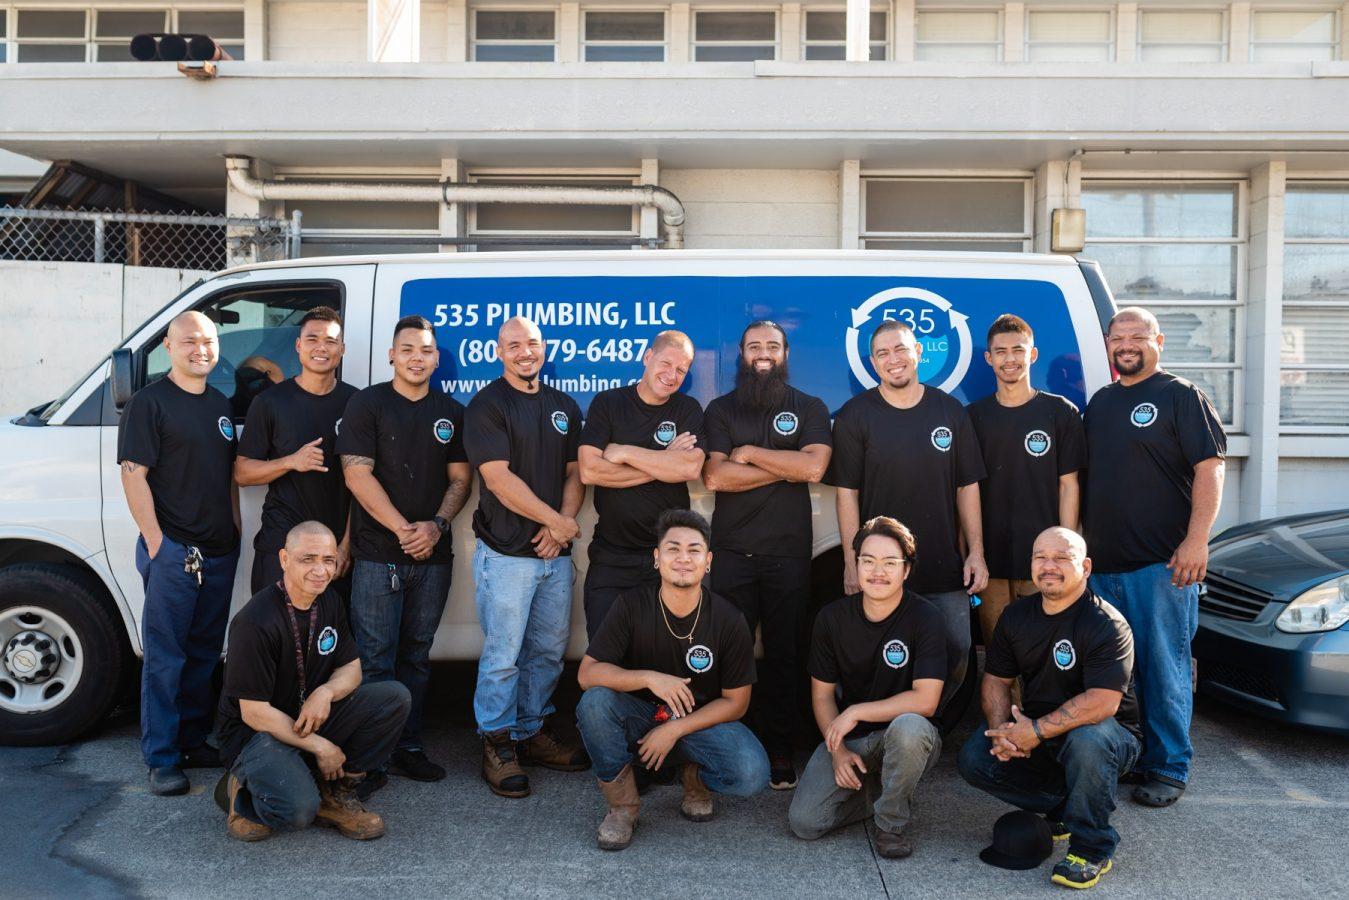 the crew of 535 Plumbing